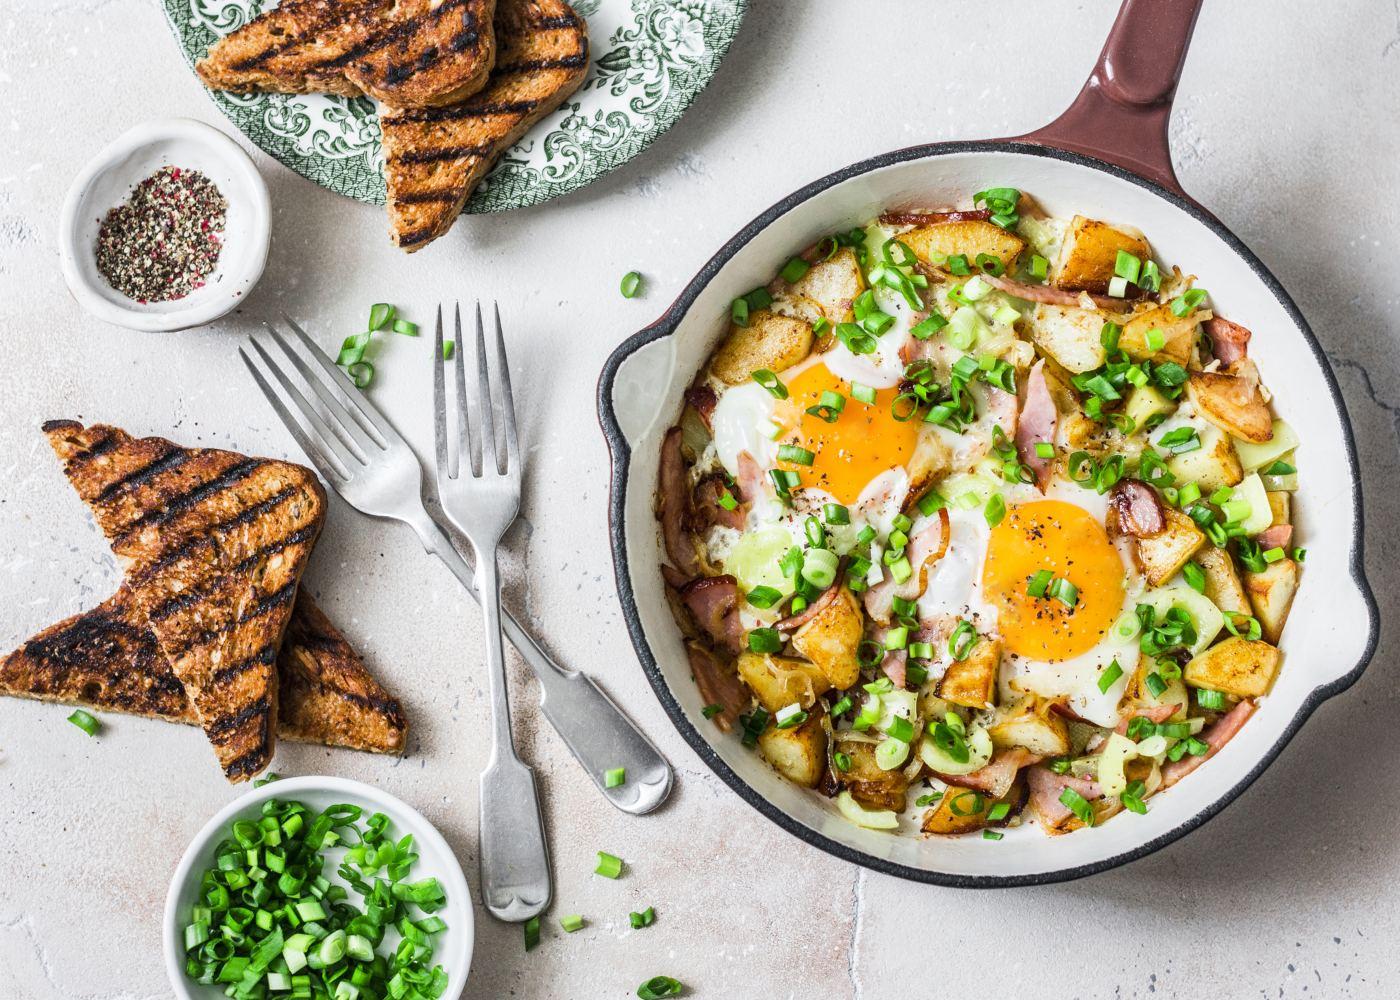 receita de ovos rotos